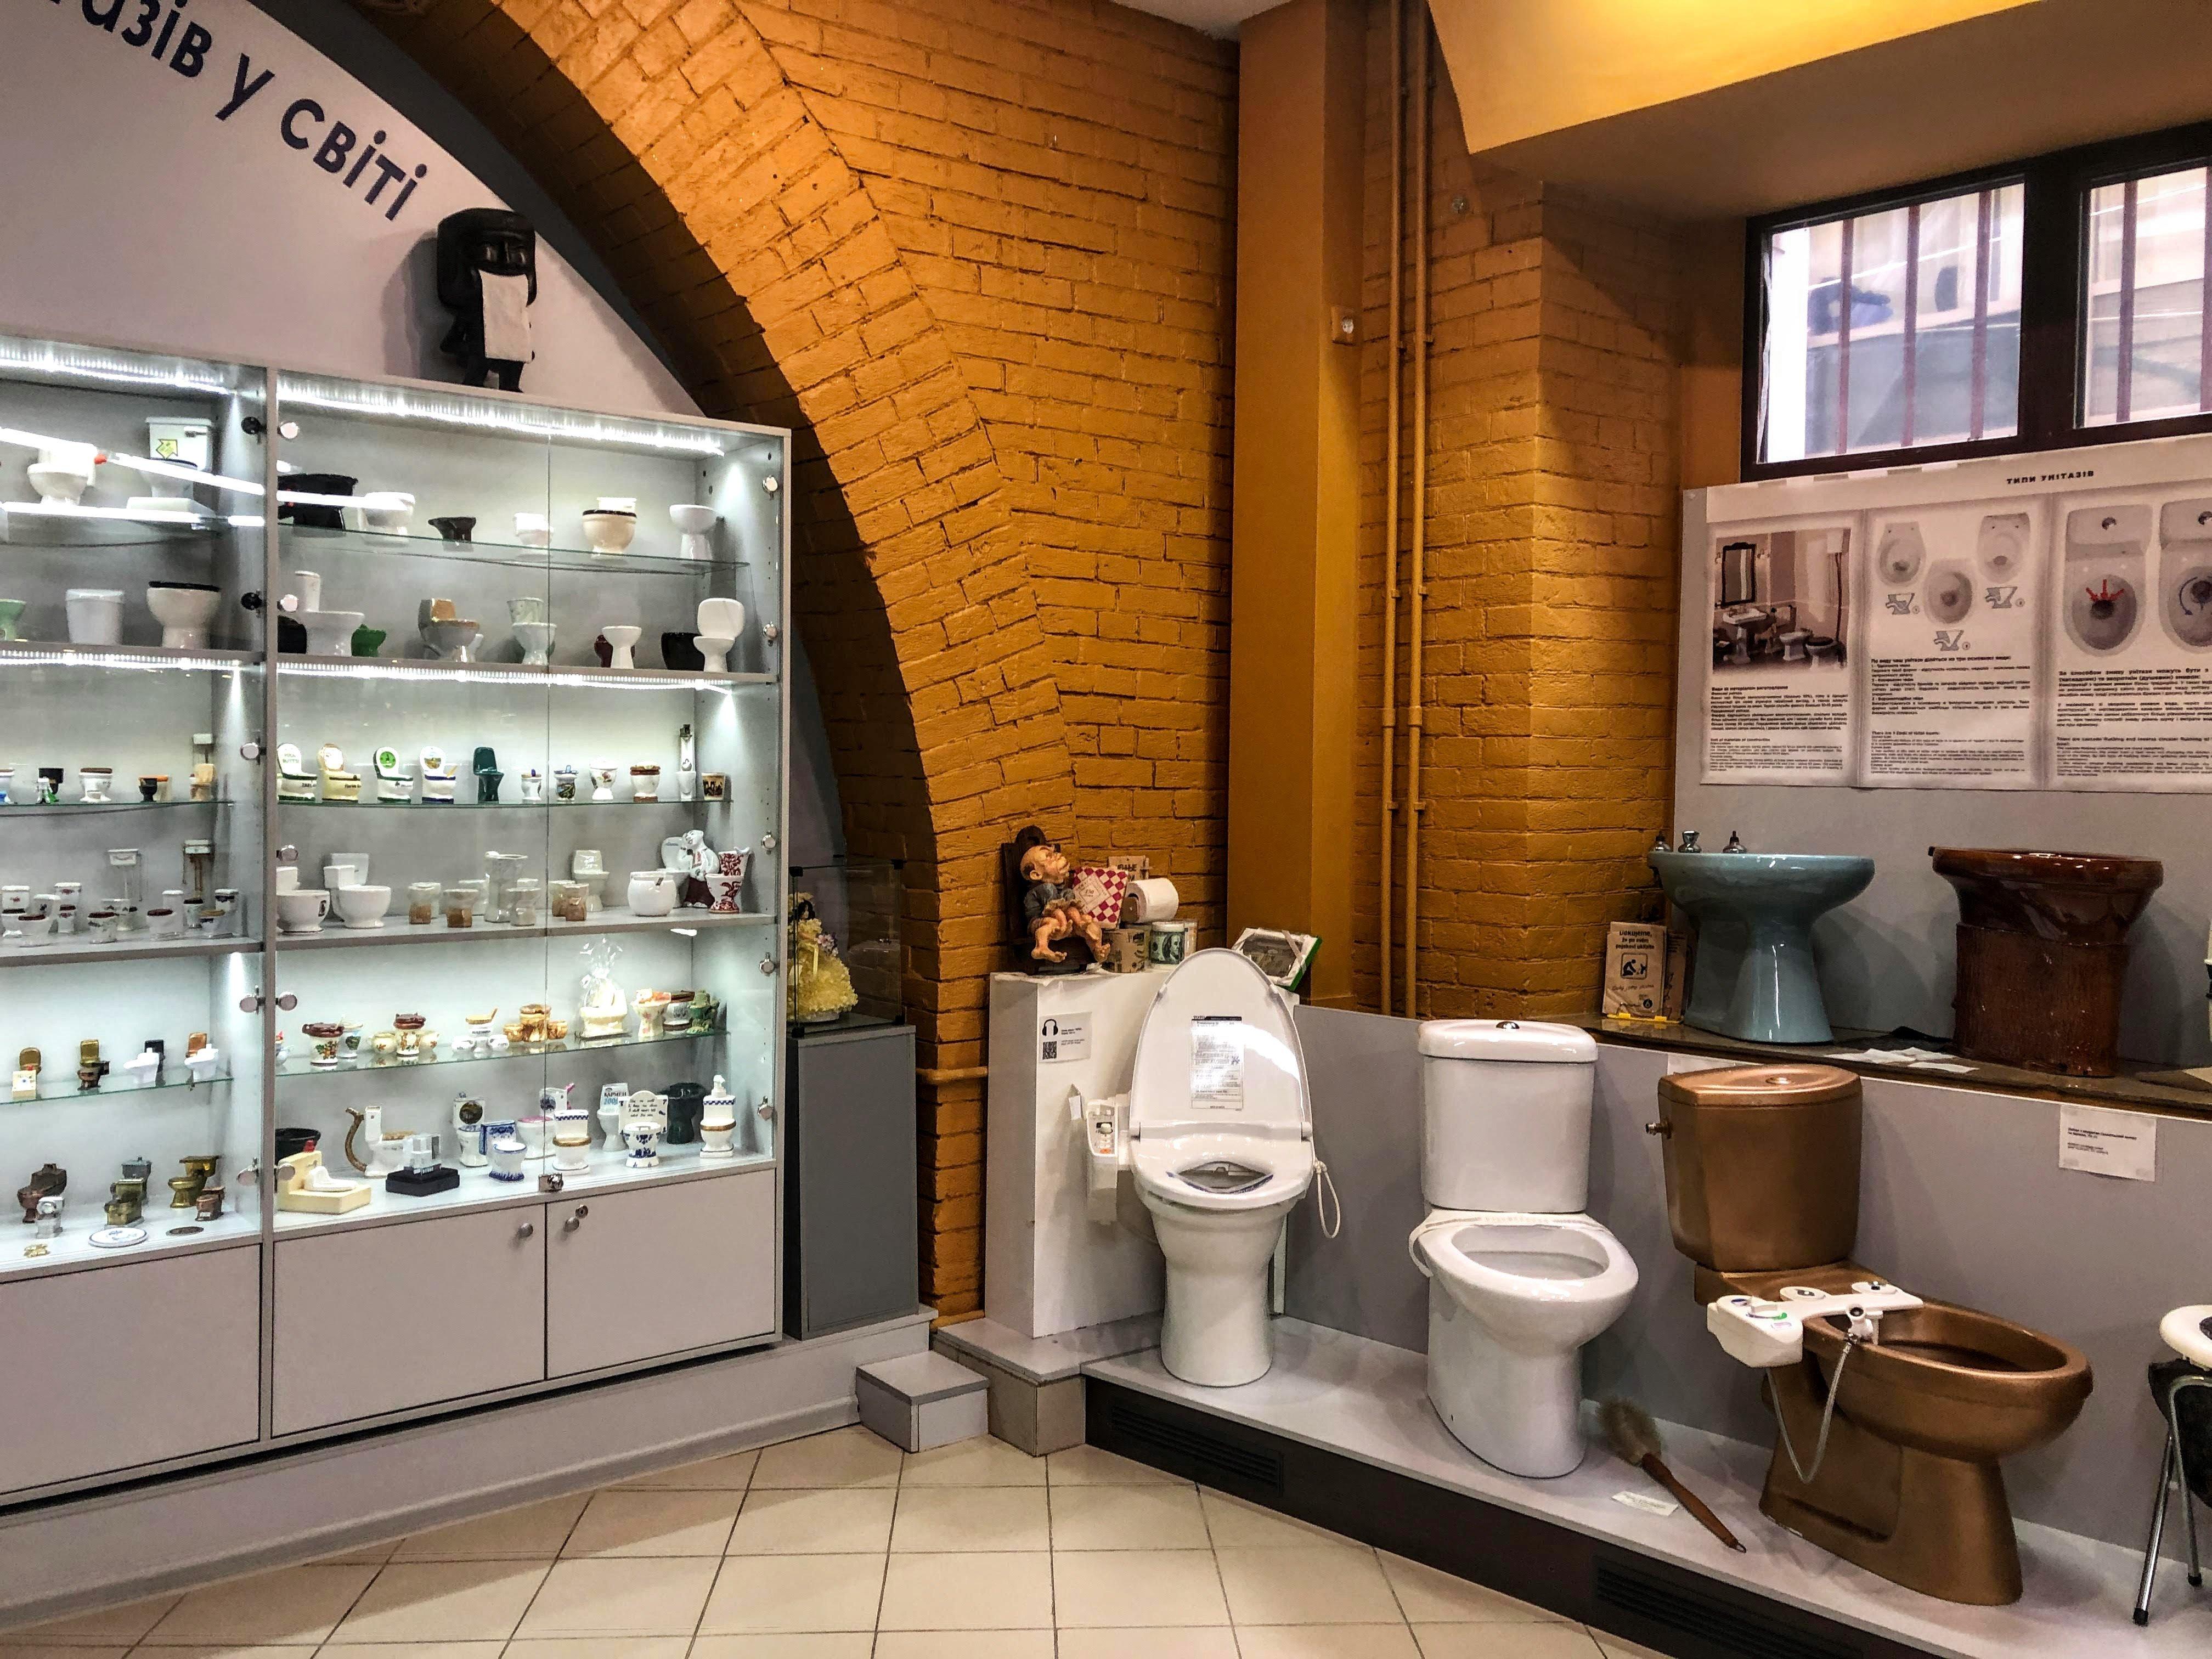 Toilet History Museum in Kiev